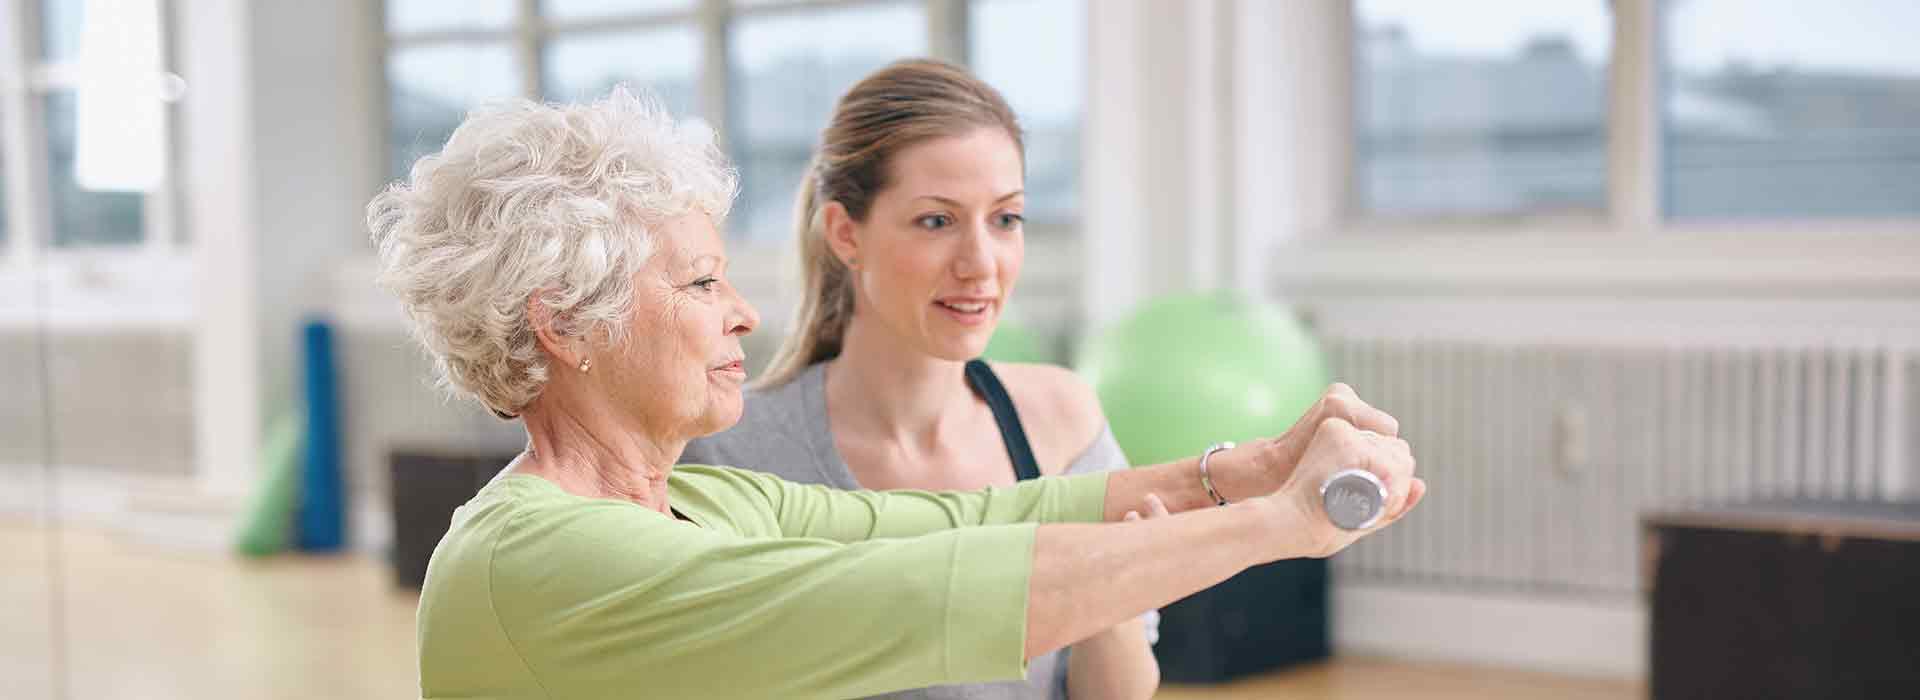 Clases de pilates para mayores